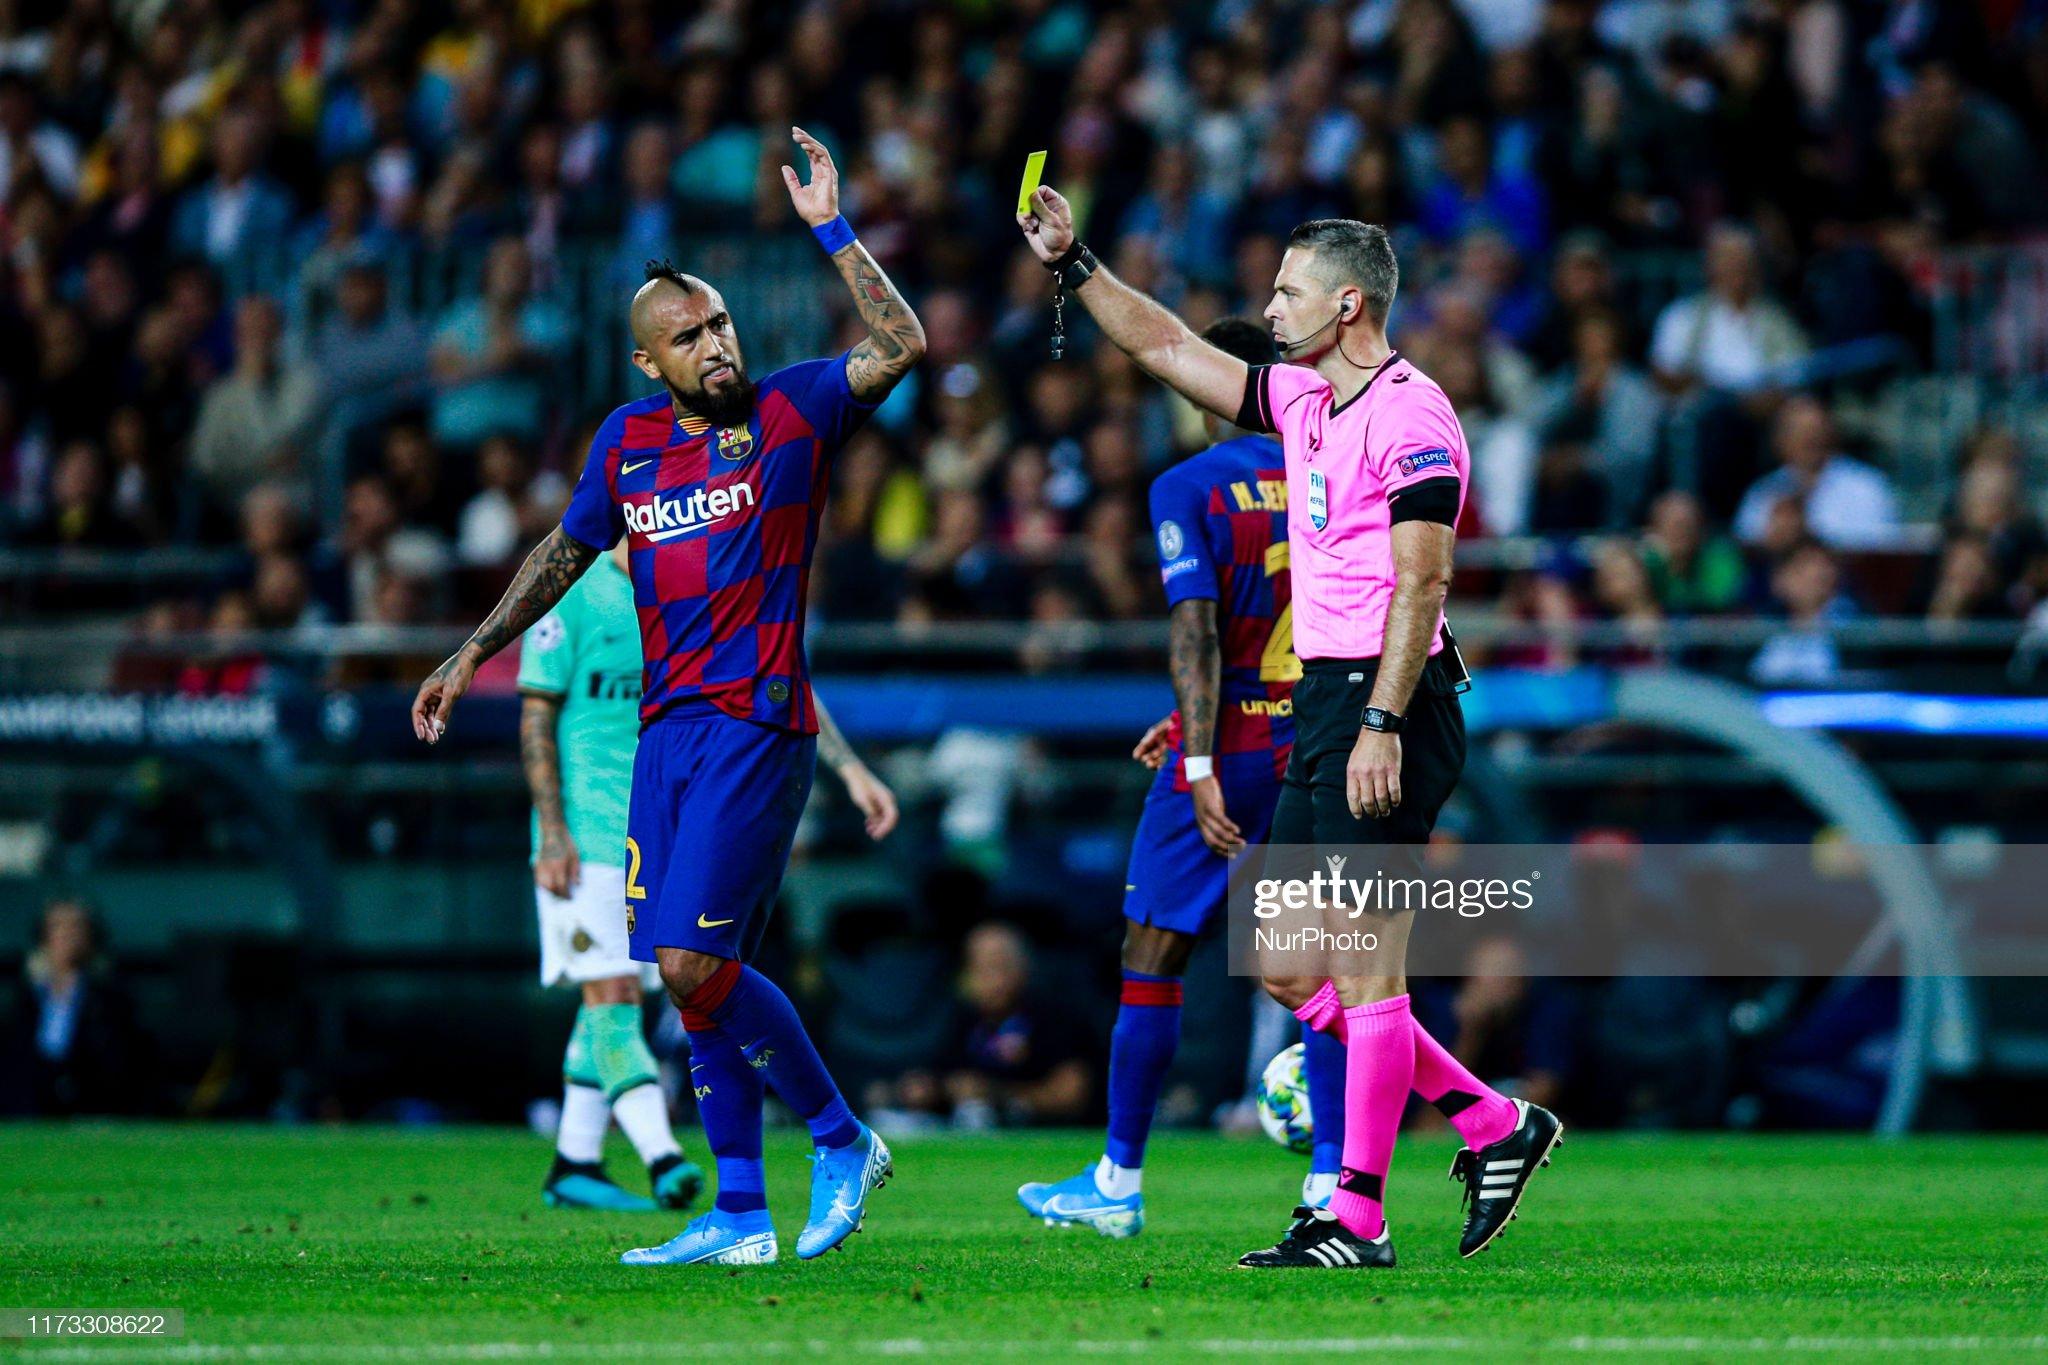 صور مباراة : برشلونة - إنتر 2-1 ( 02-10-2019 )  Arturo-vidal-from-chile-of-fc-barcelona-reciving-a-yellow-card-from-picture-id1173308622?s=2048x2048